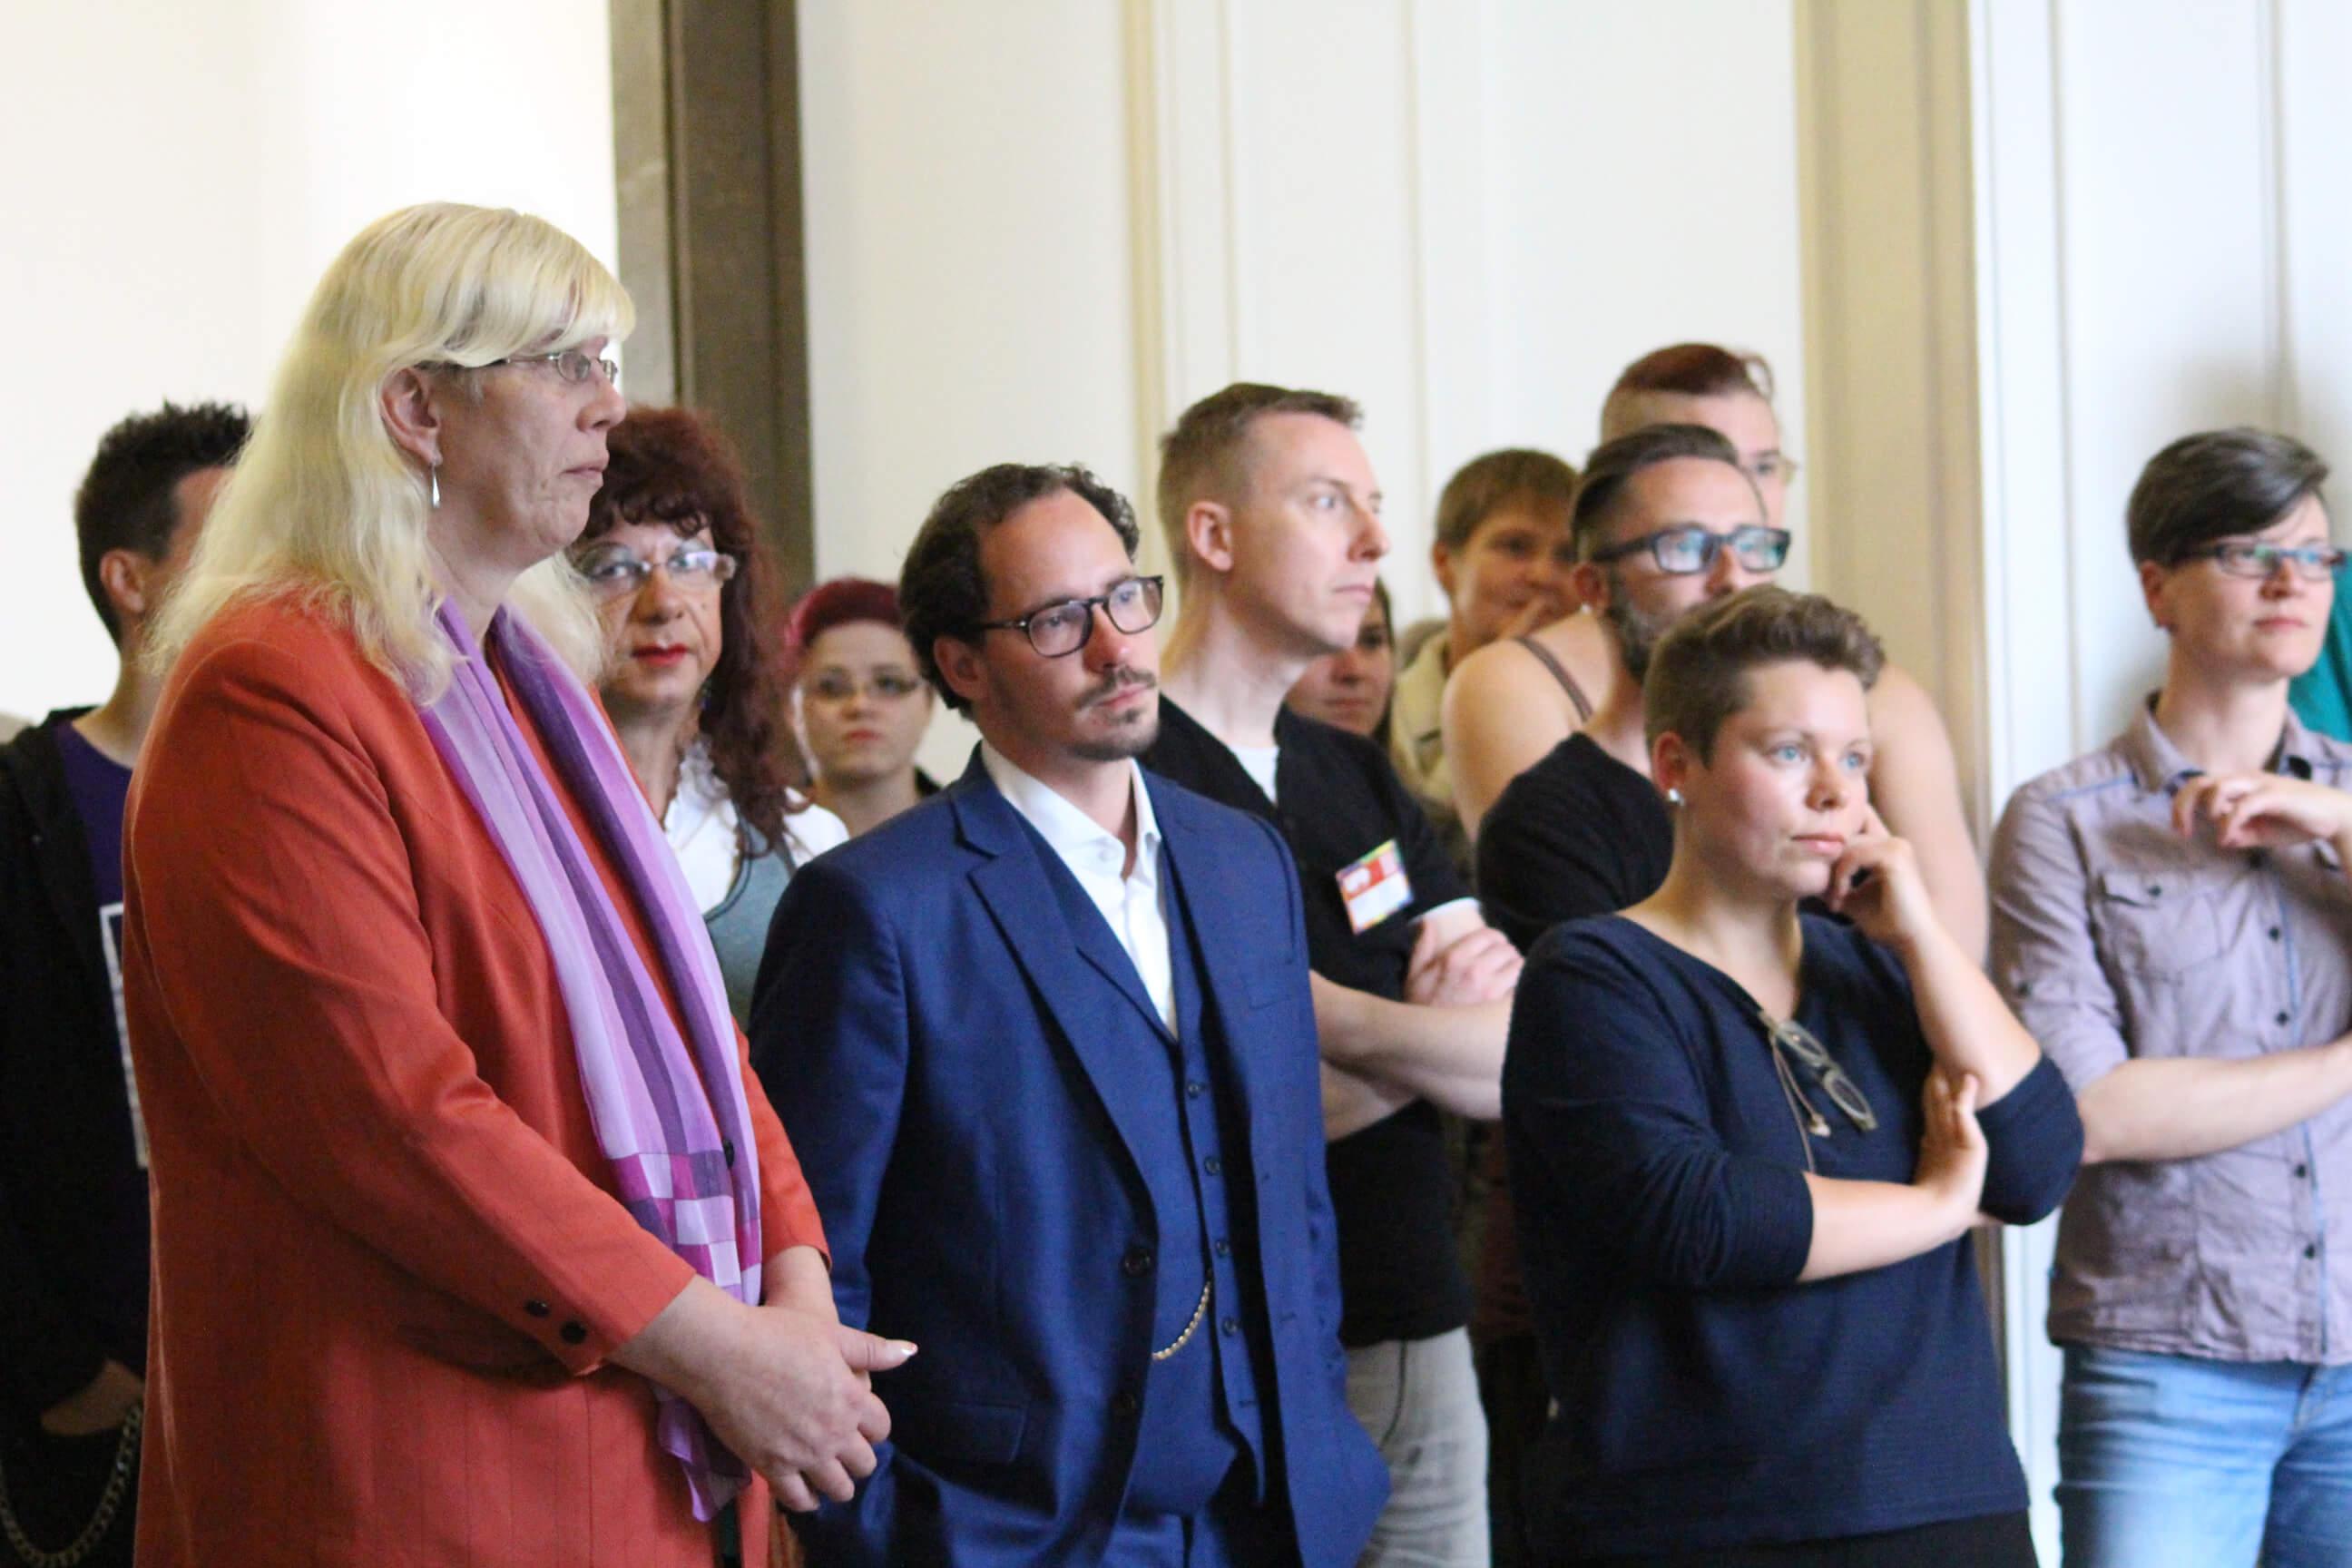 Fachtag Kinder- und Jugendhilfe & Schule verqueeren!